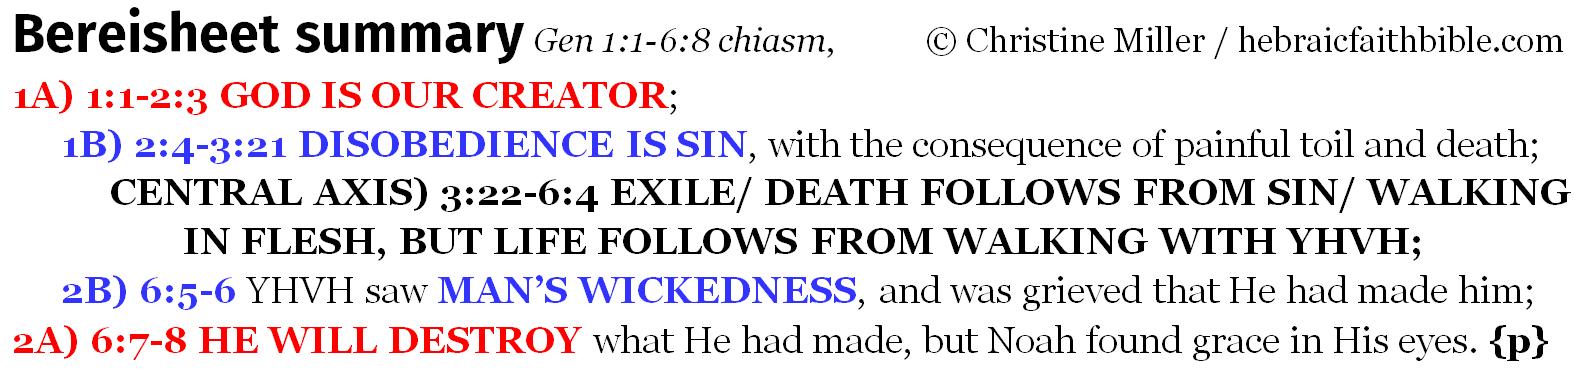 Gen 1:1-6:8 Bereisheet summary chiasm | hebraicfaithbible.com